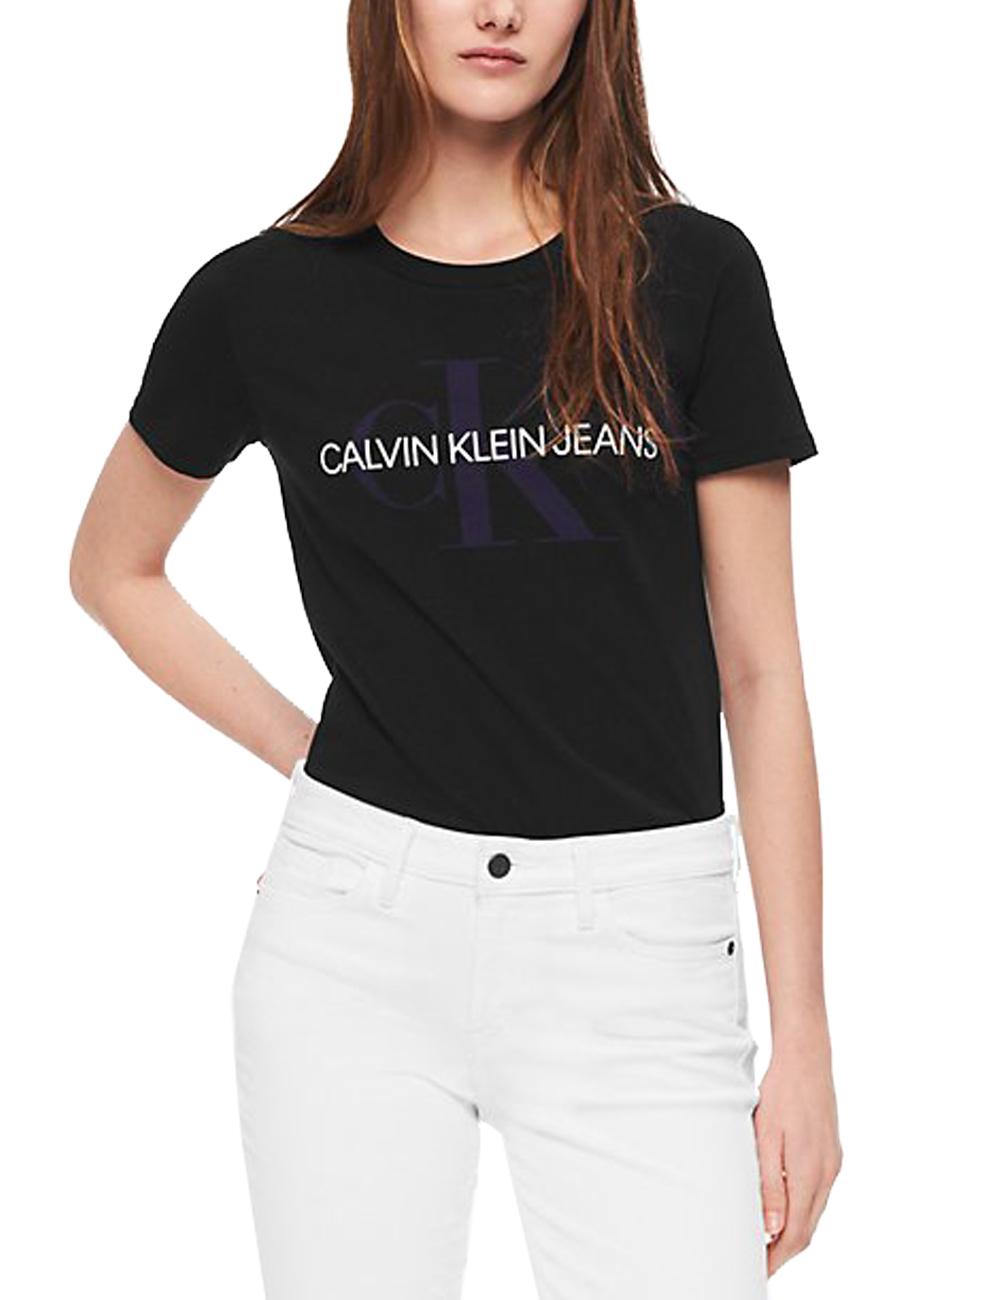 9ad32f2fe0d4f9 Damen T-Shirt, Calvin Klein, schwarz